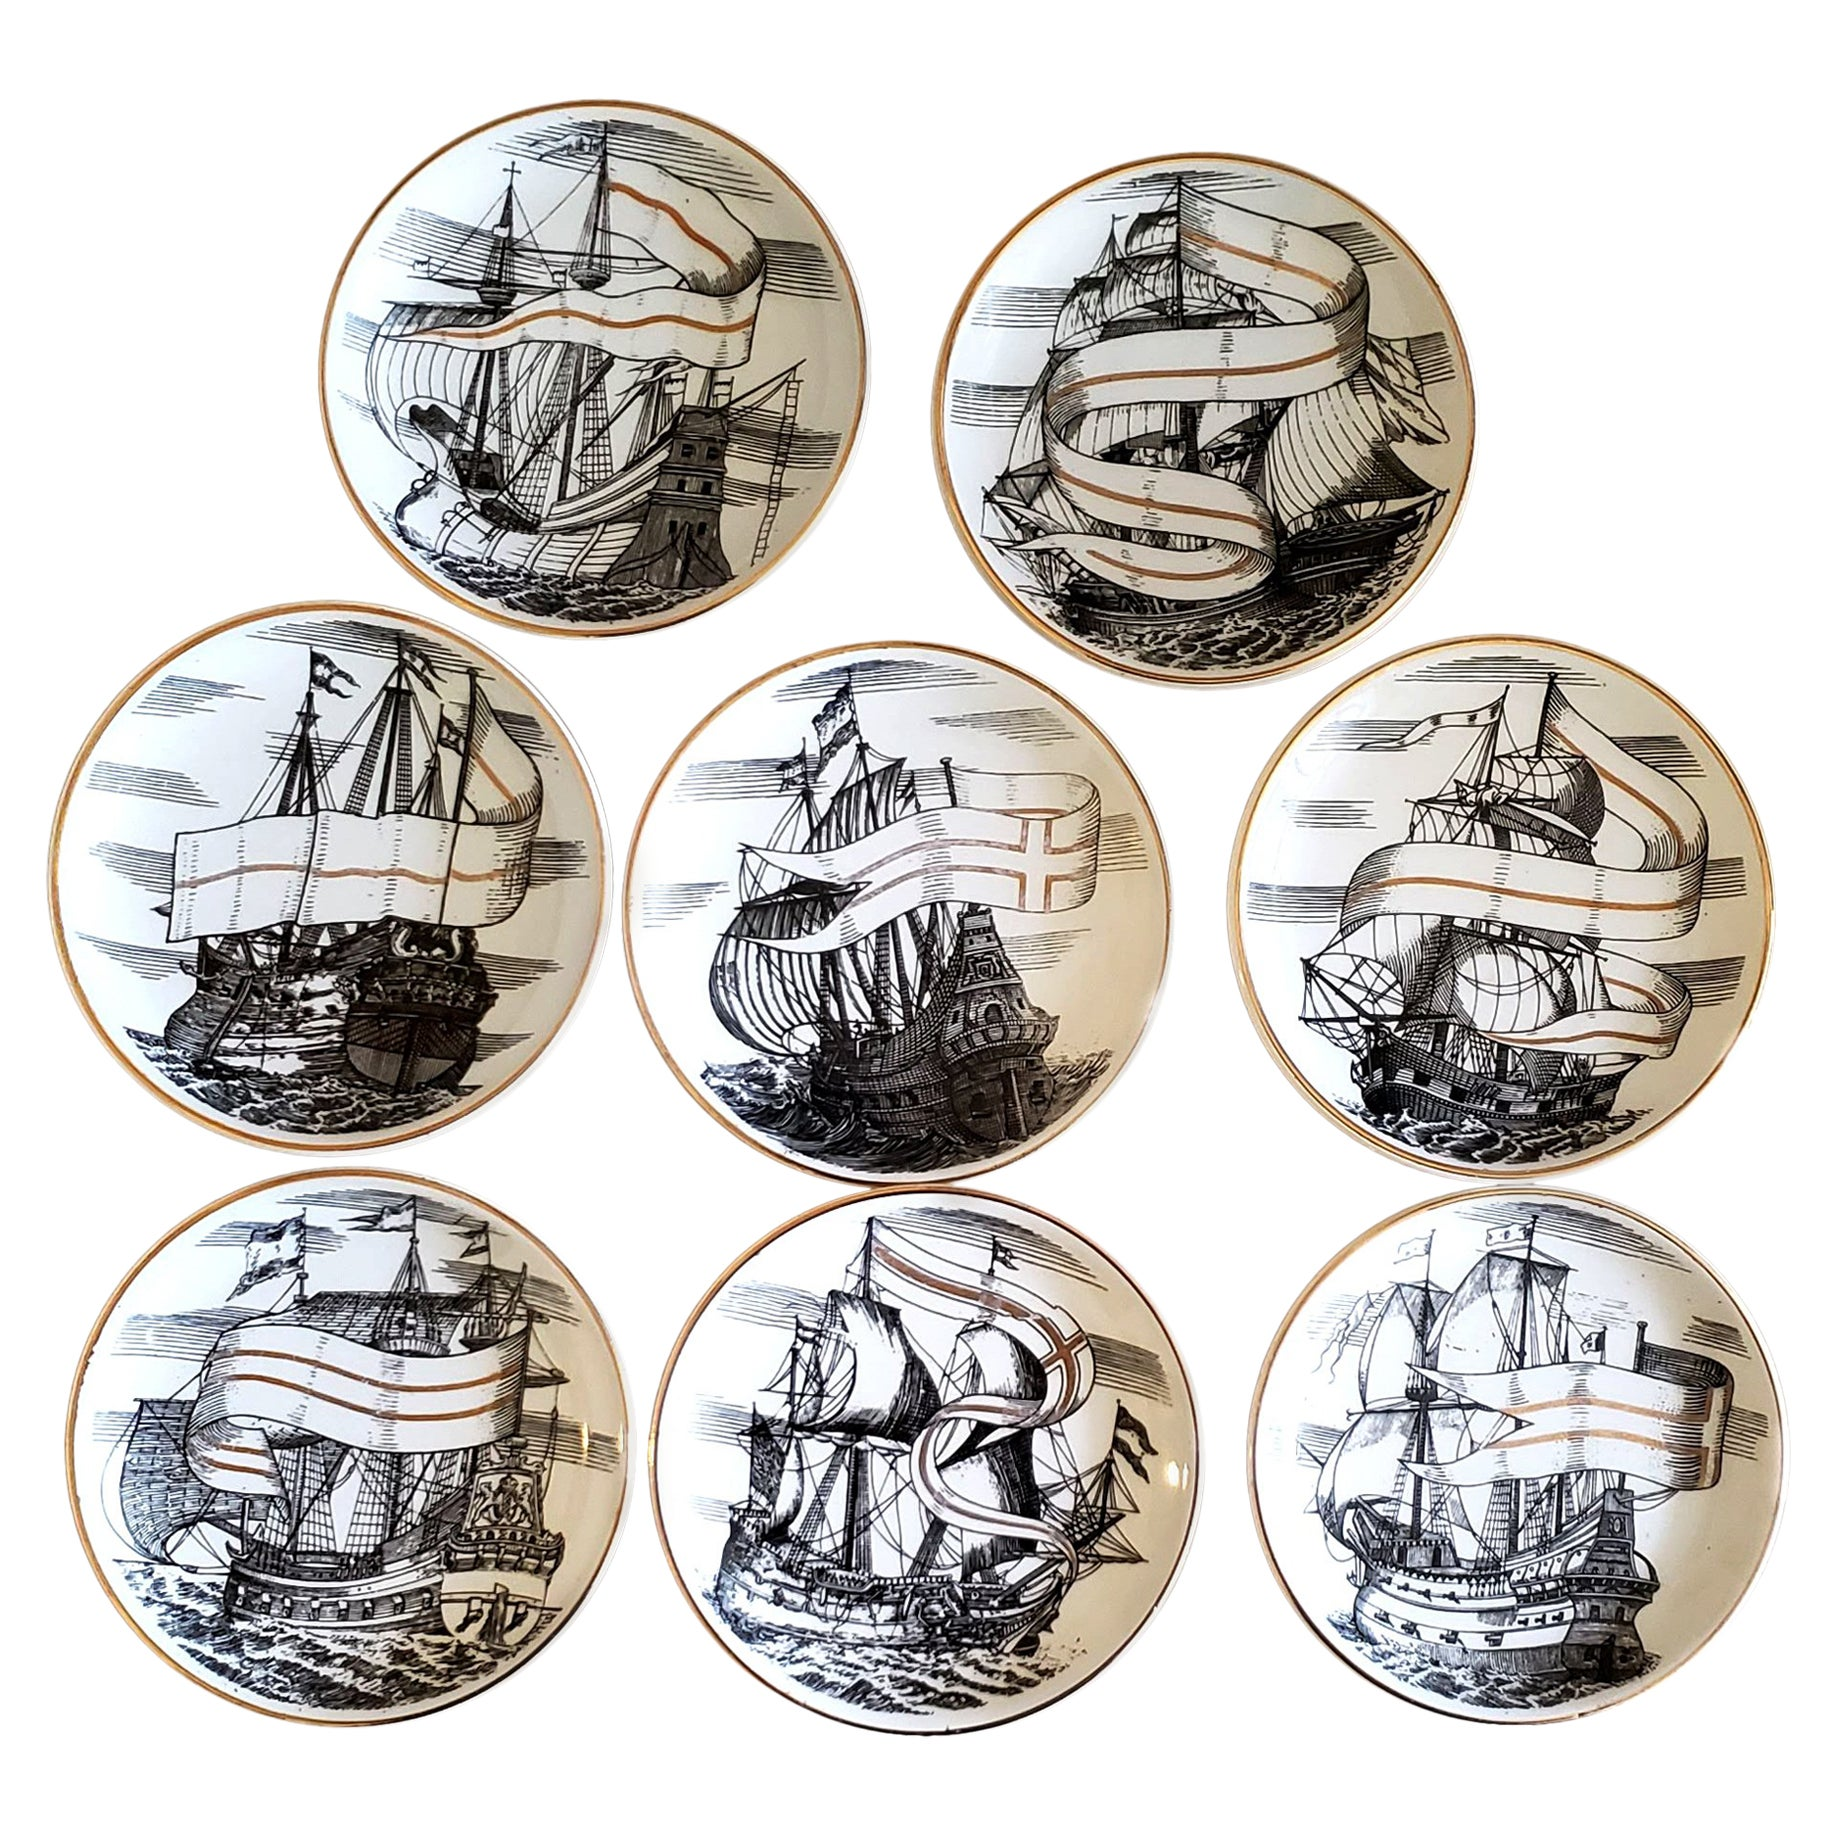 Piero Fornasetti Porcelain Set of Eight Ship Coasters, Velieri with Original Box